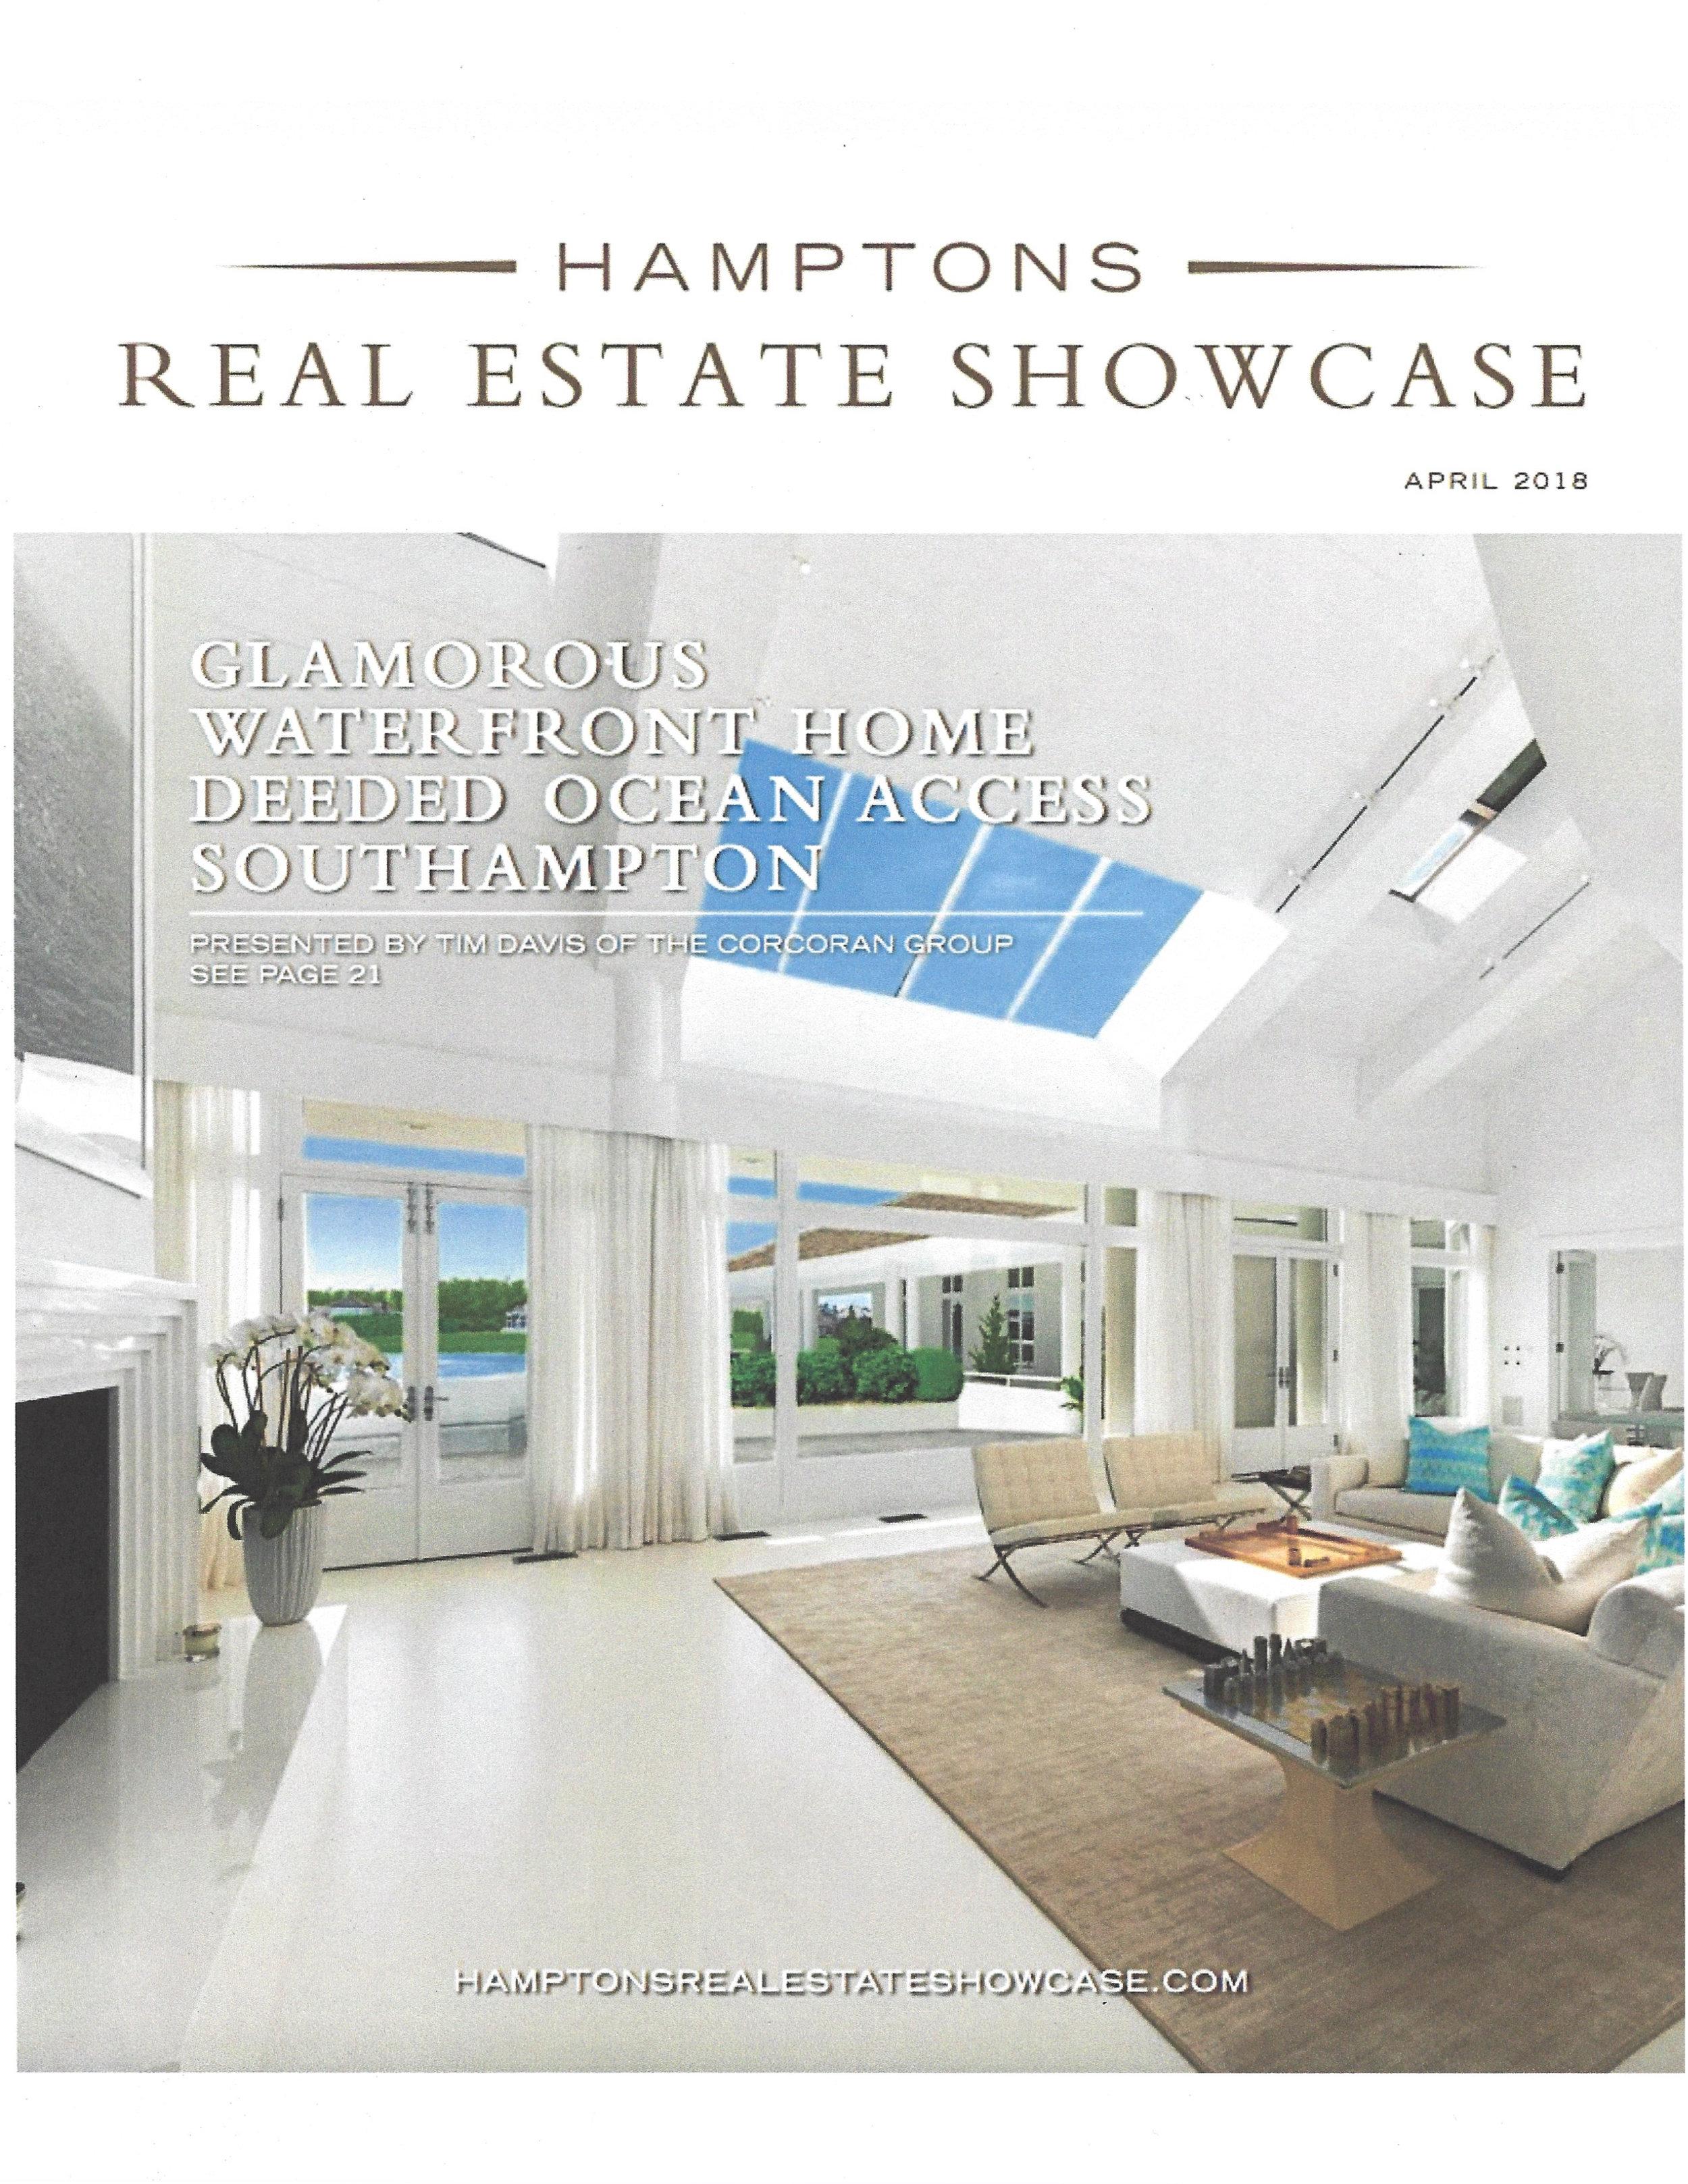 Hampton Real Estate Showcase_April 2018.jpg